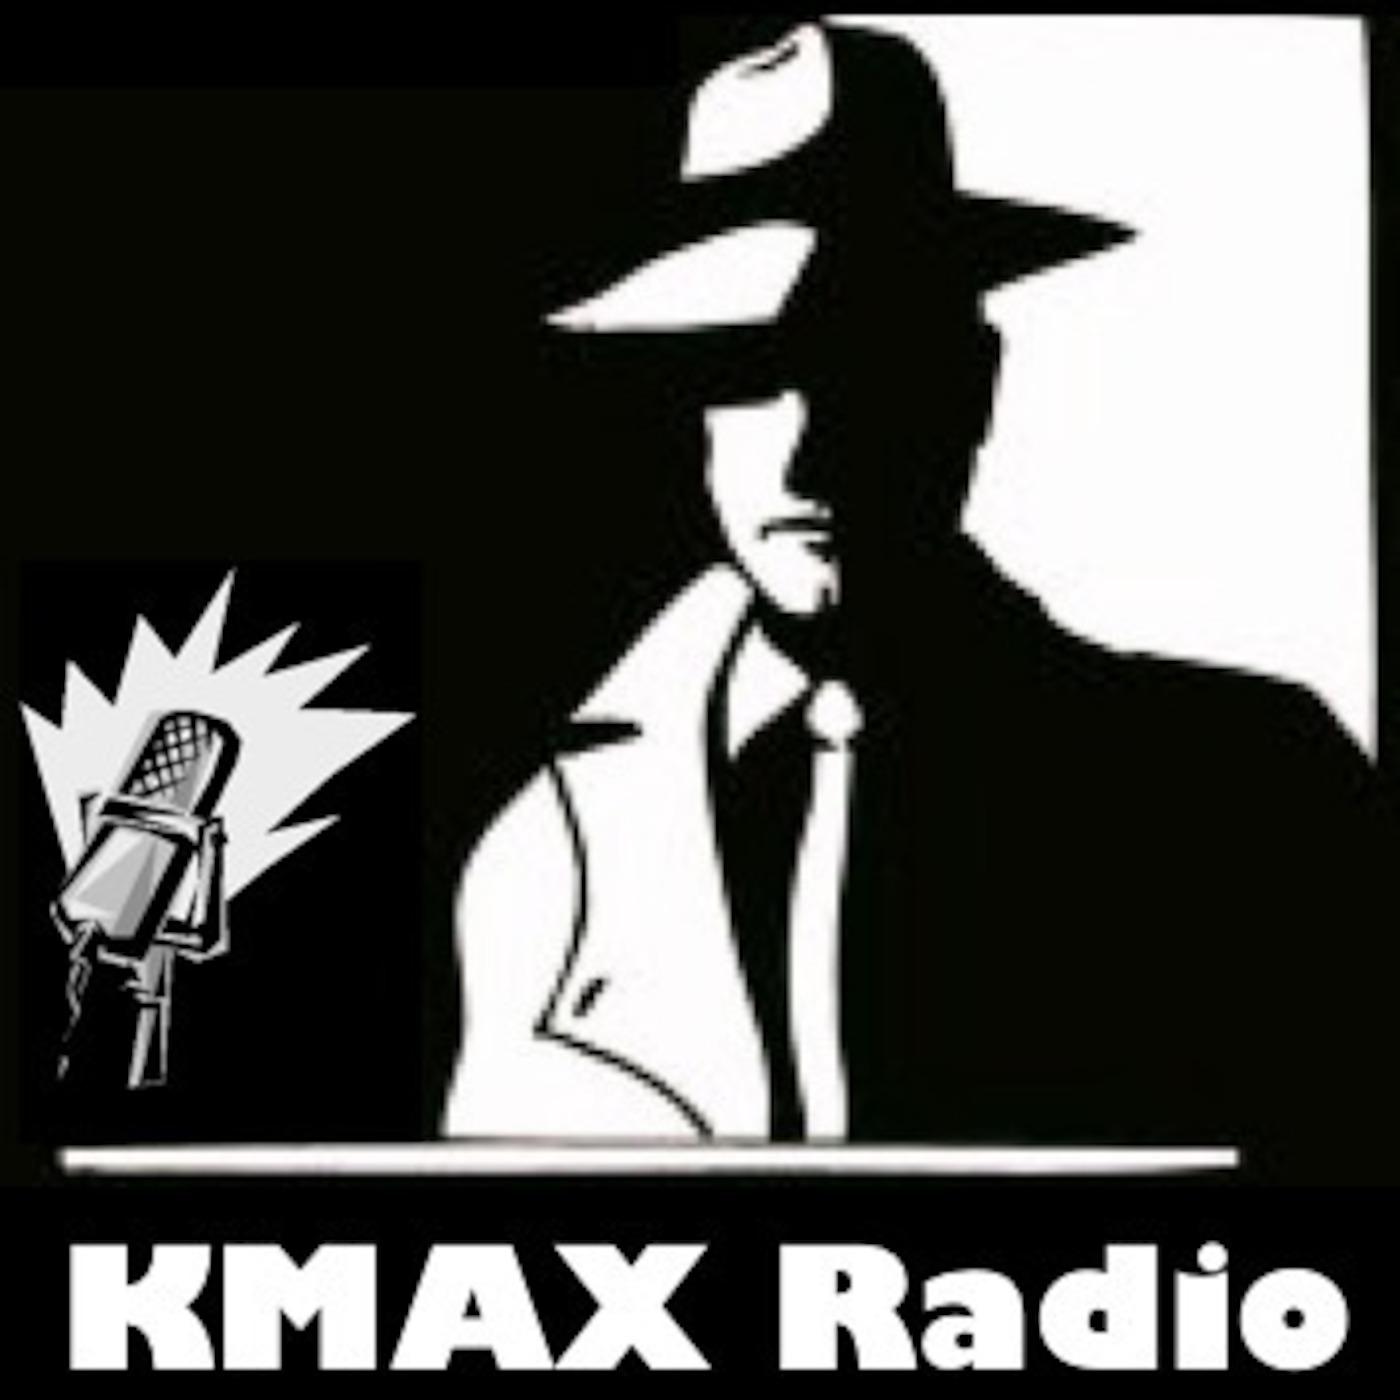 KMAX Radio